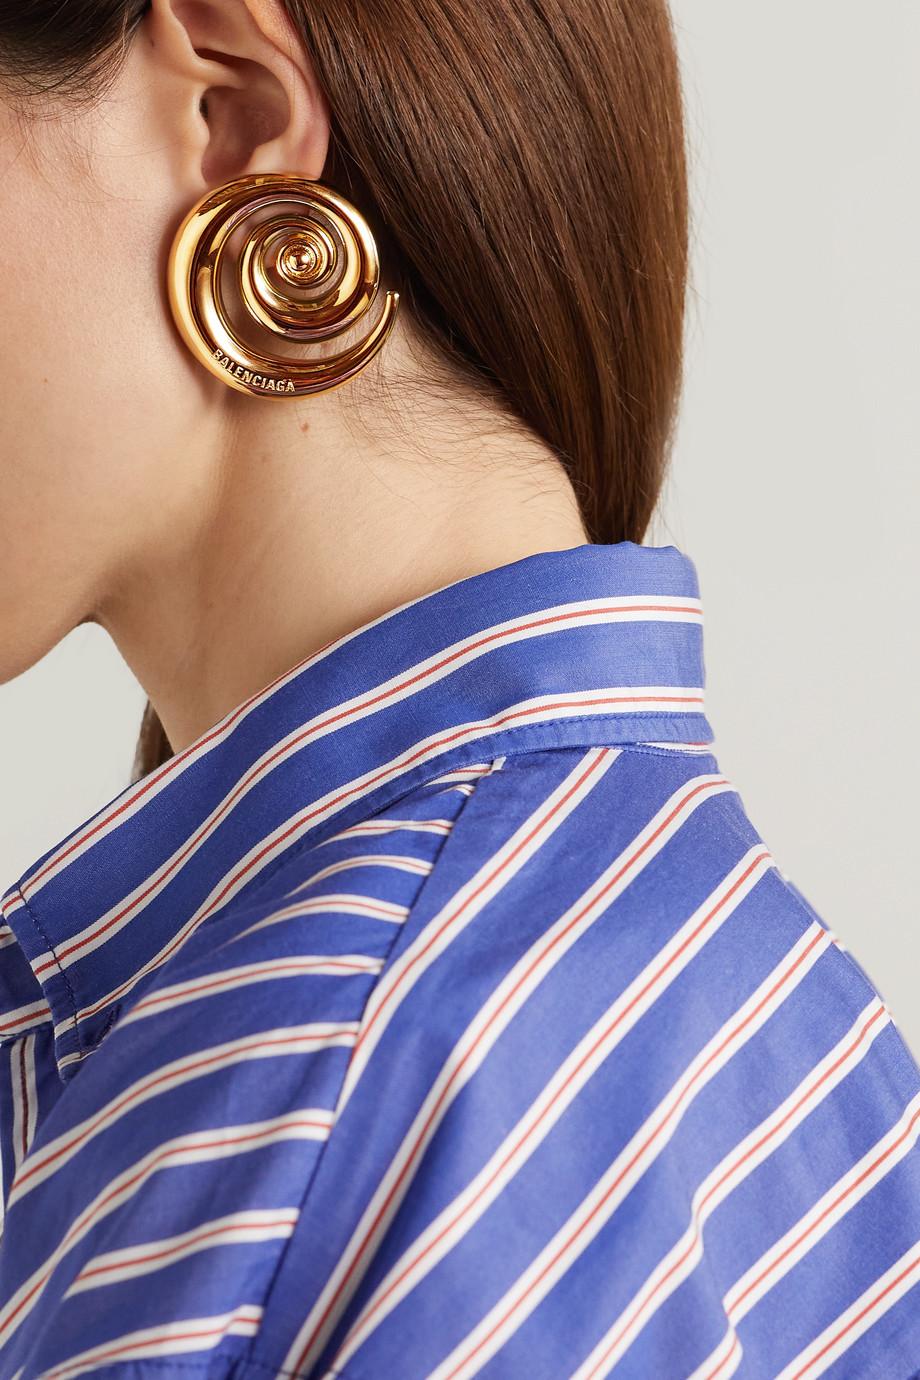 Balenciaga Snail oversized gold-tone earrings